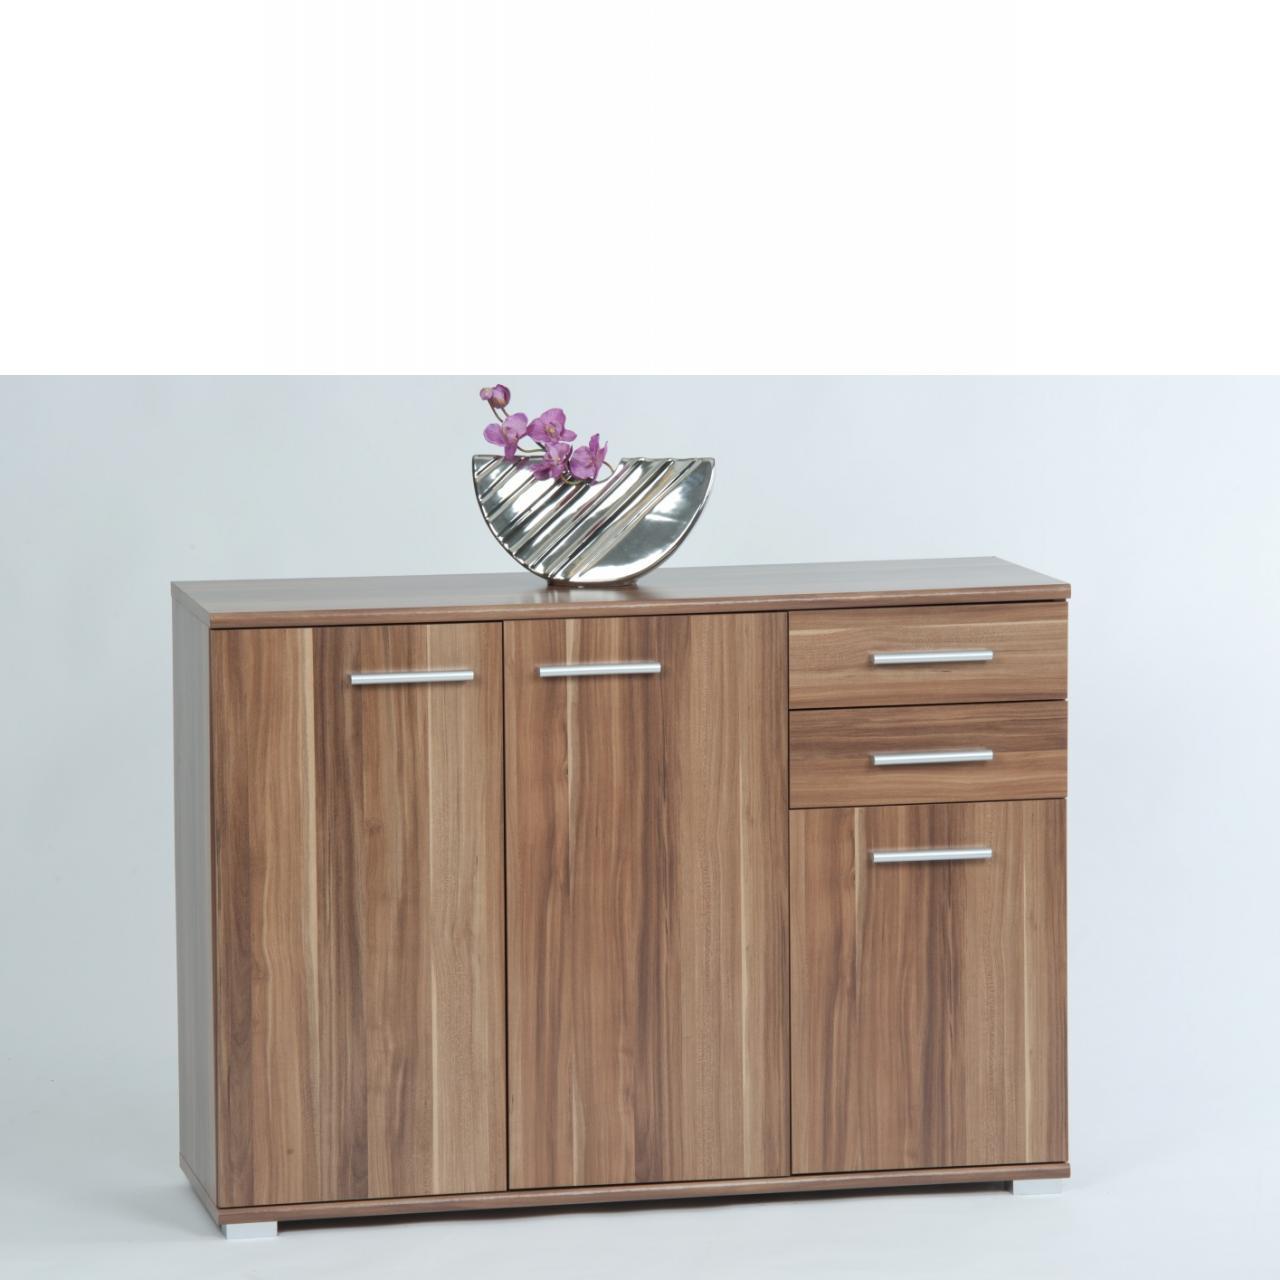 kommode walnuss kommode lana walnuss klassisch barock stilmbel kaufen bei kapa with kommode. Black Bedroom Furniture Sets. Home Design Ideas